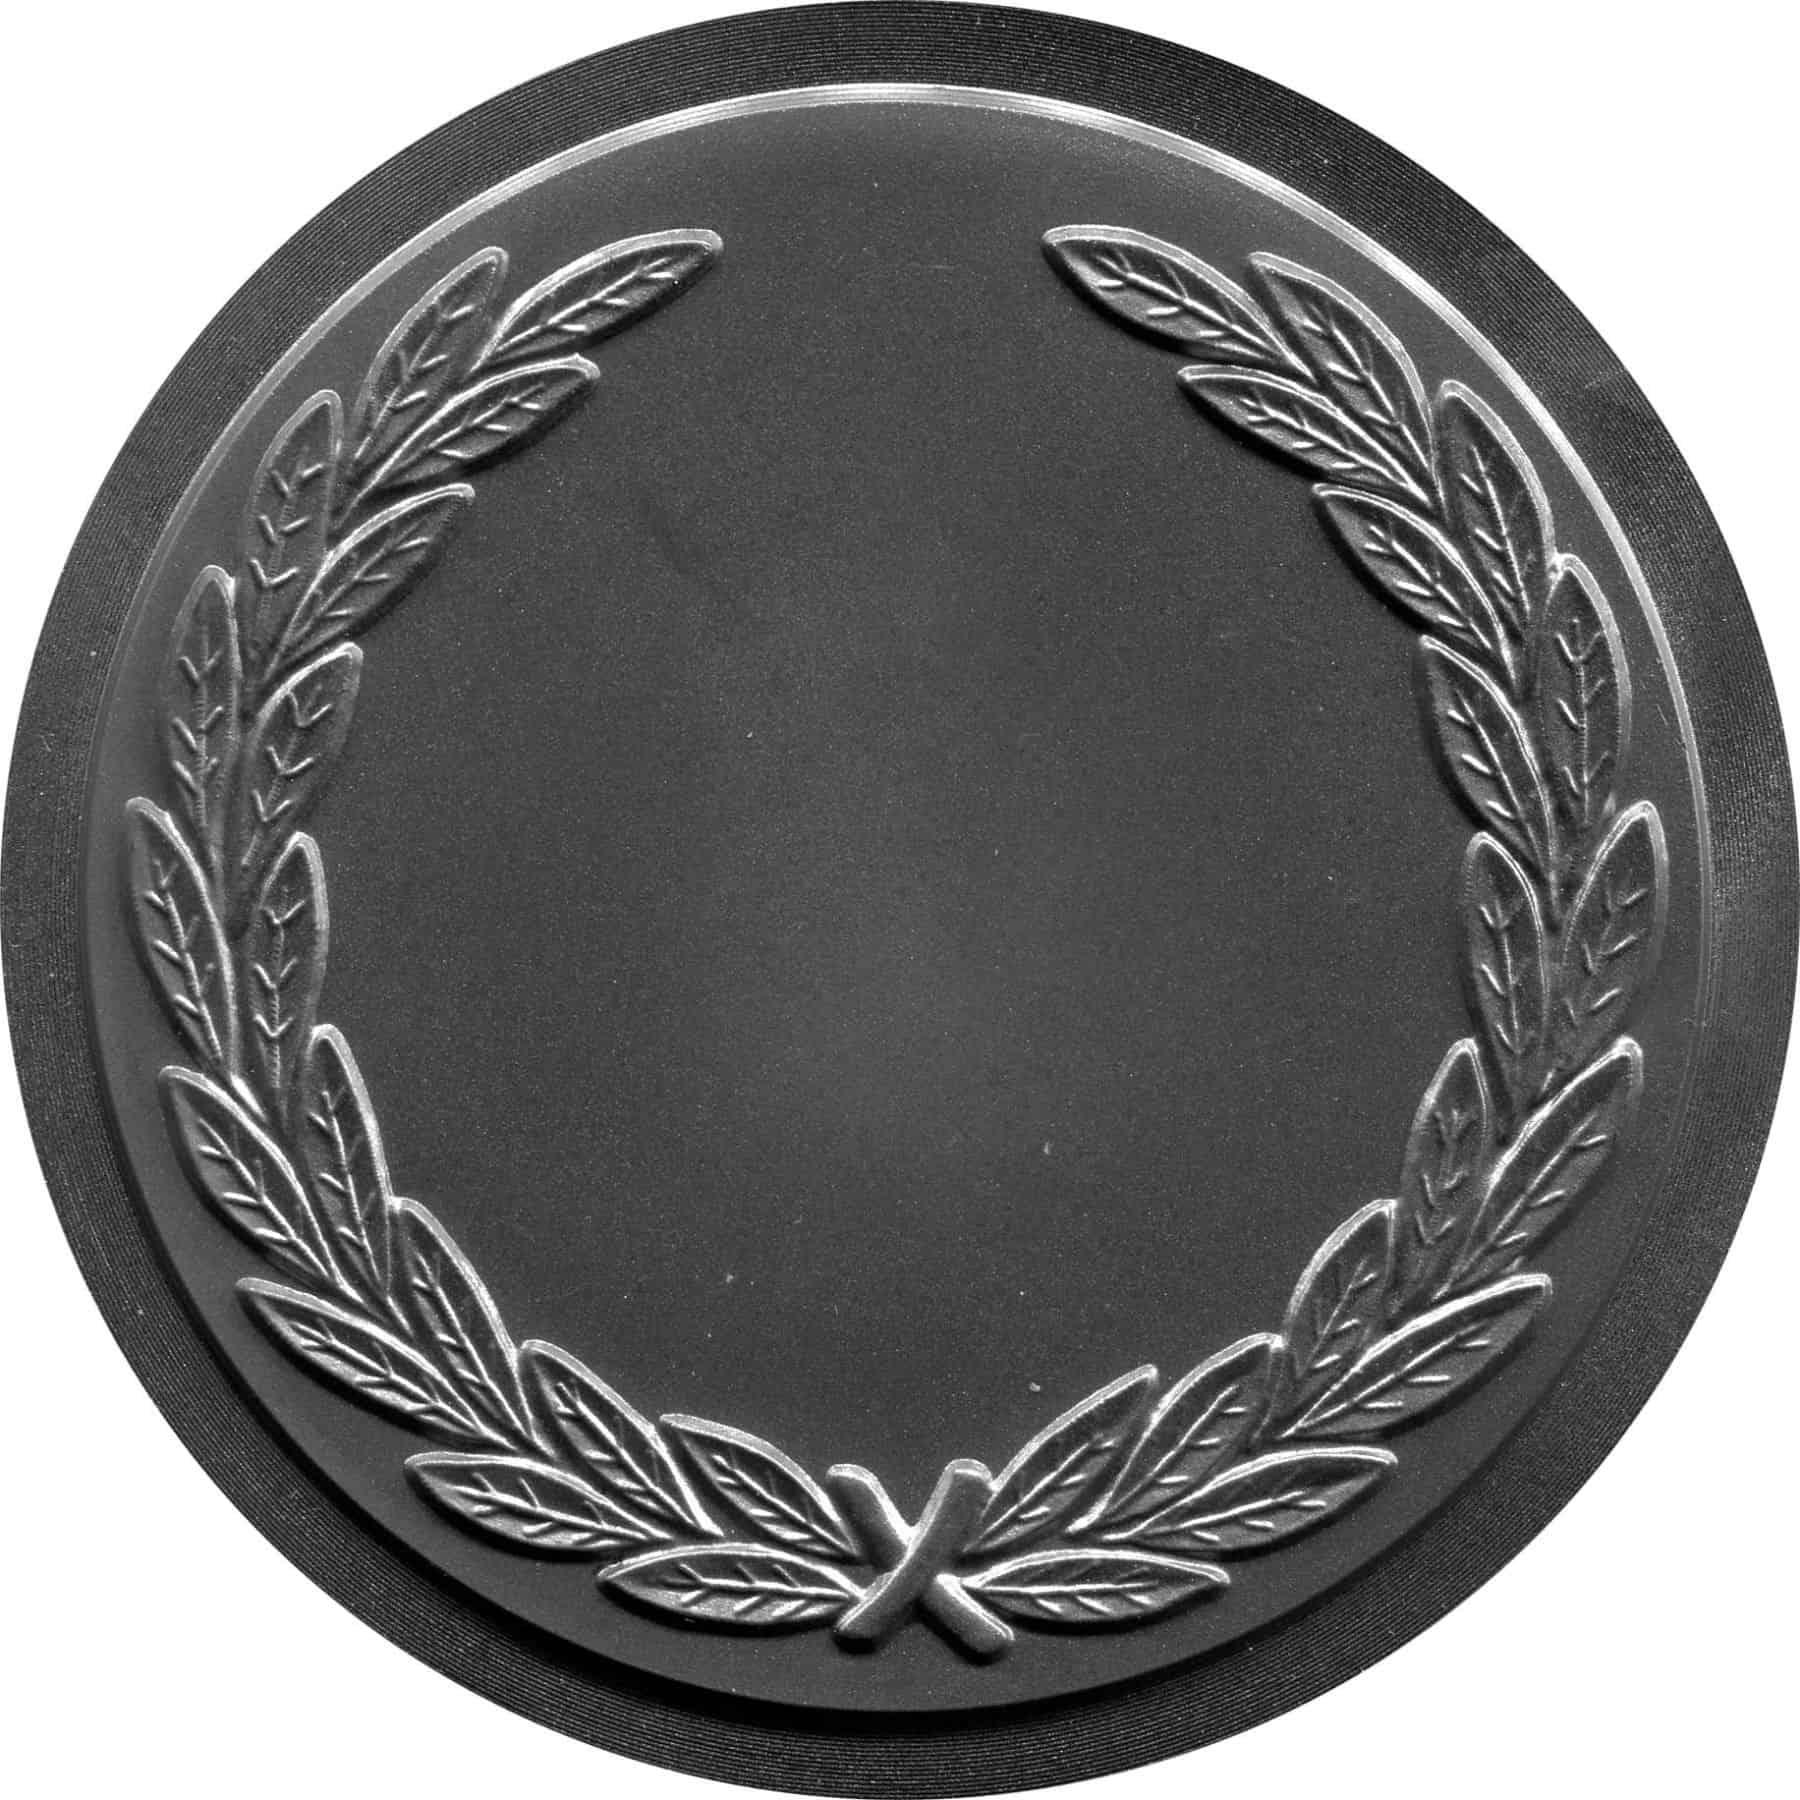 Medalcraft Mint Die